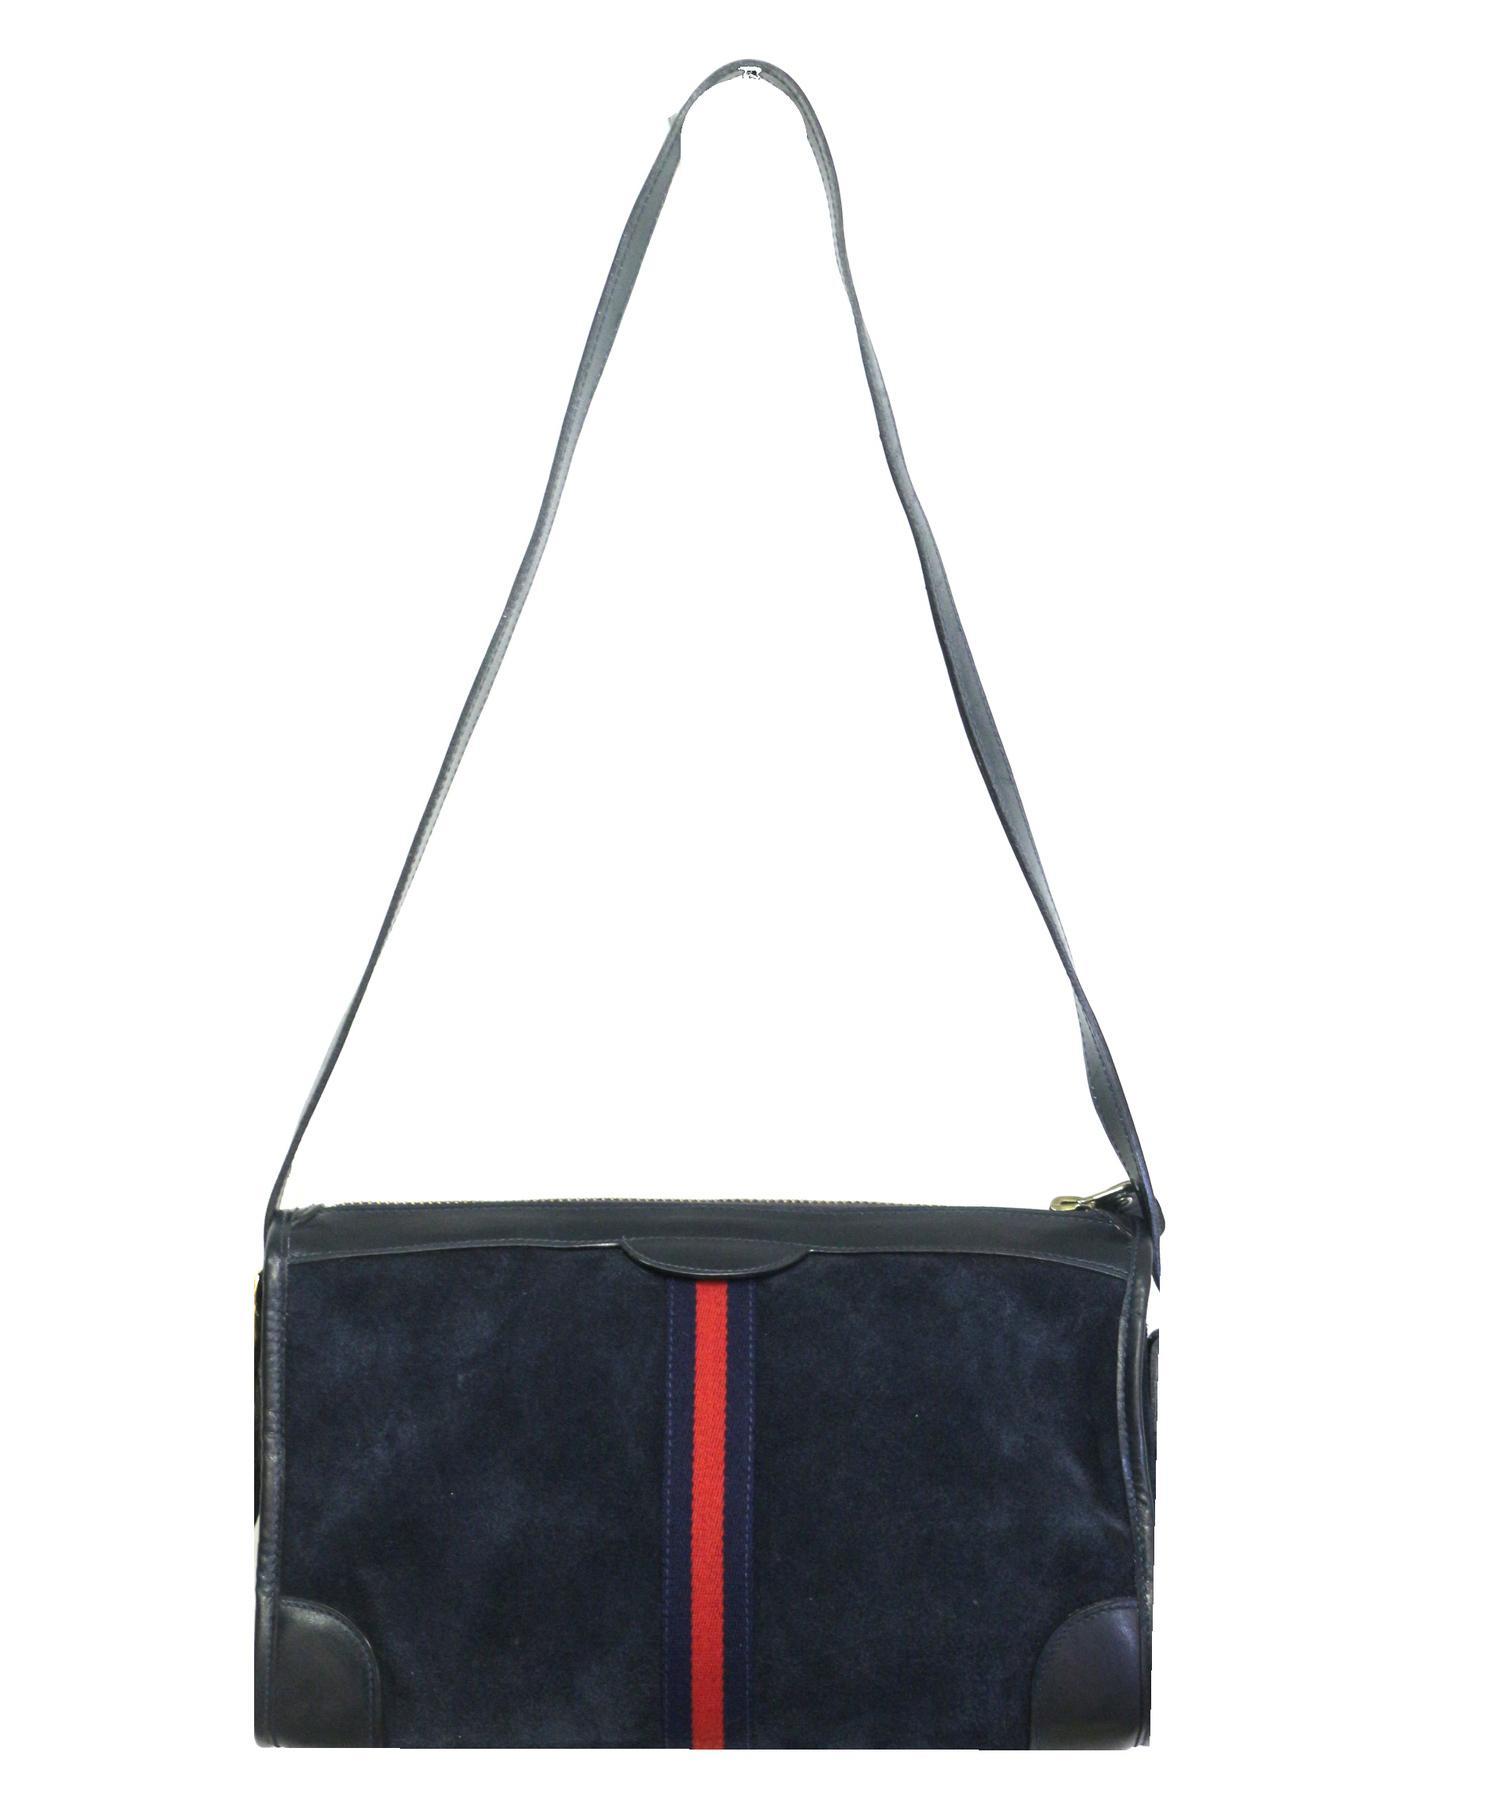 brand new de639 84eec [中古]OLD GUCCI(オールドグッチ)のレディース バッグ ショルダーバッグ